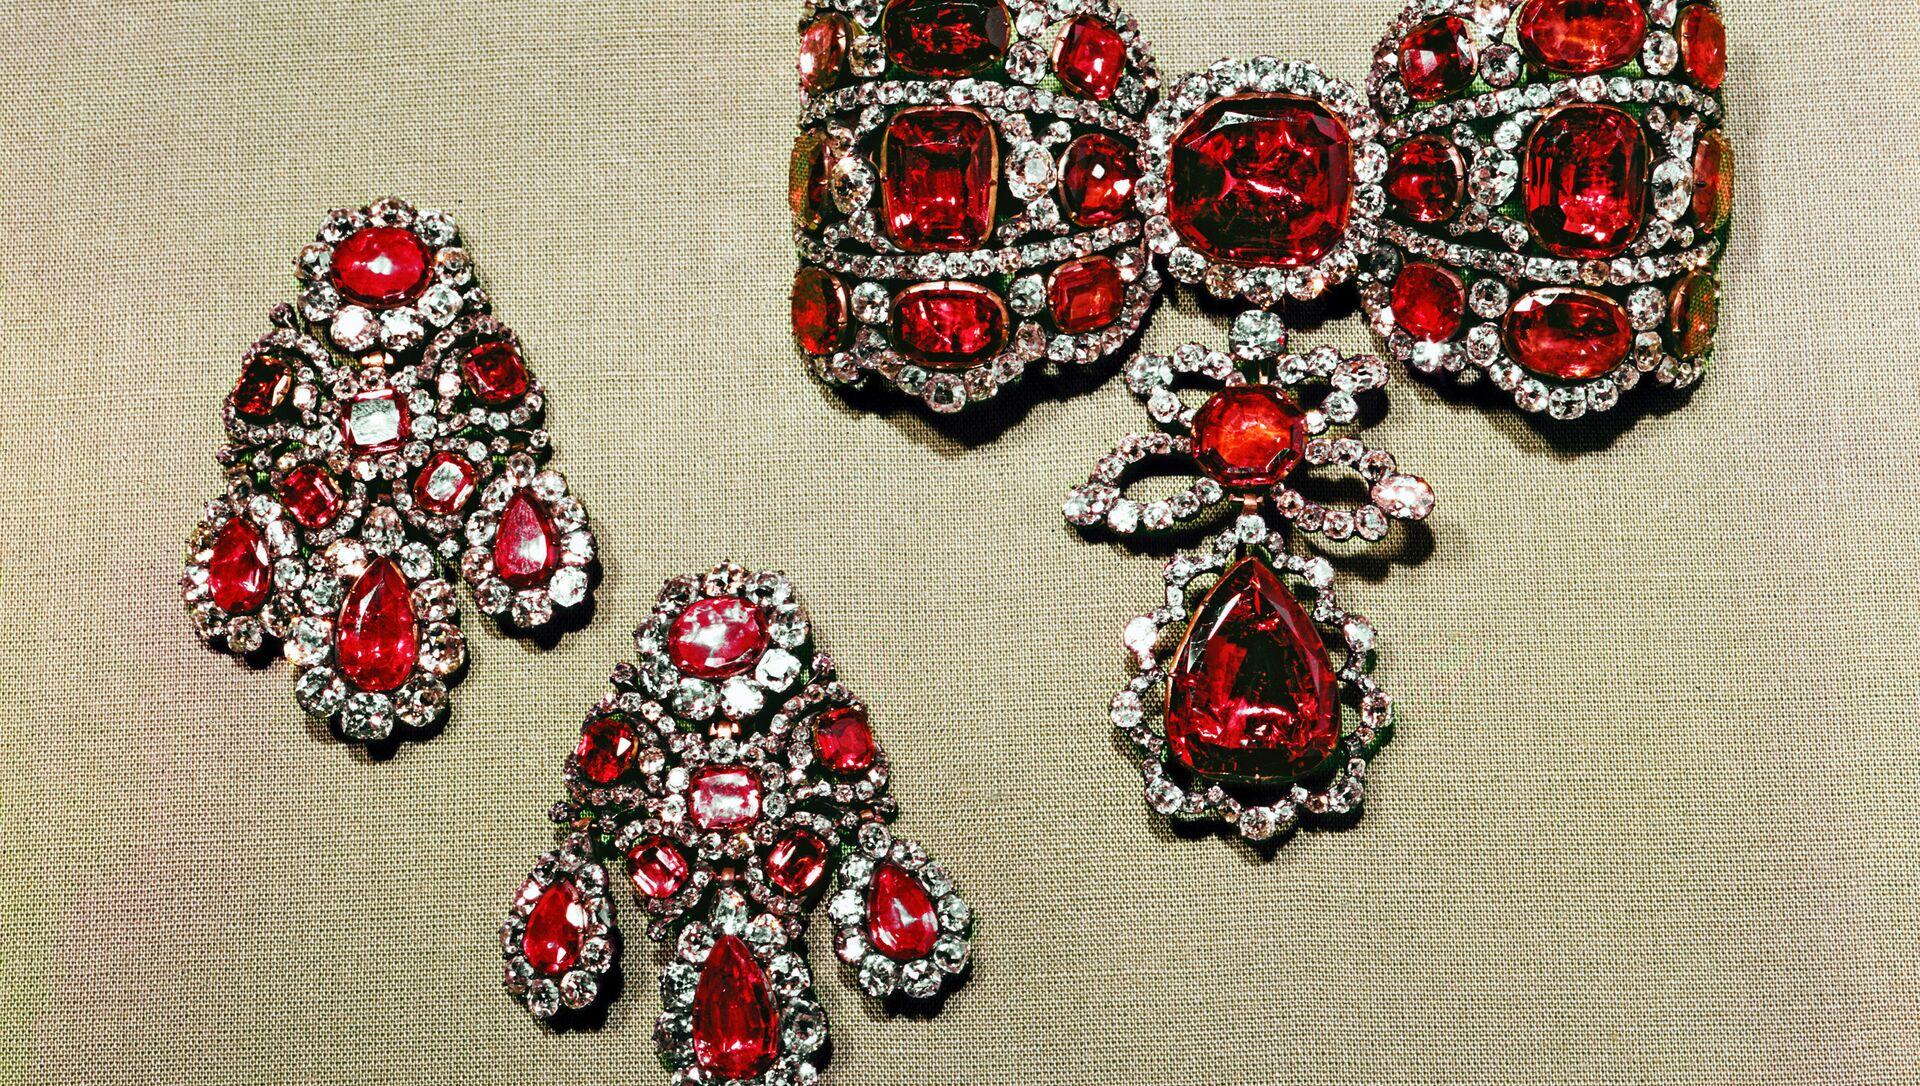 Bow en-esclavage and pendants from the Russian Diamond Fund - Sputnik International, 1920, 30.07.2021